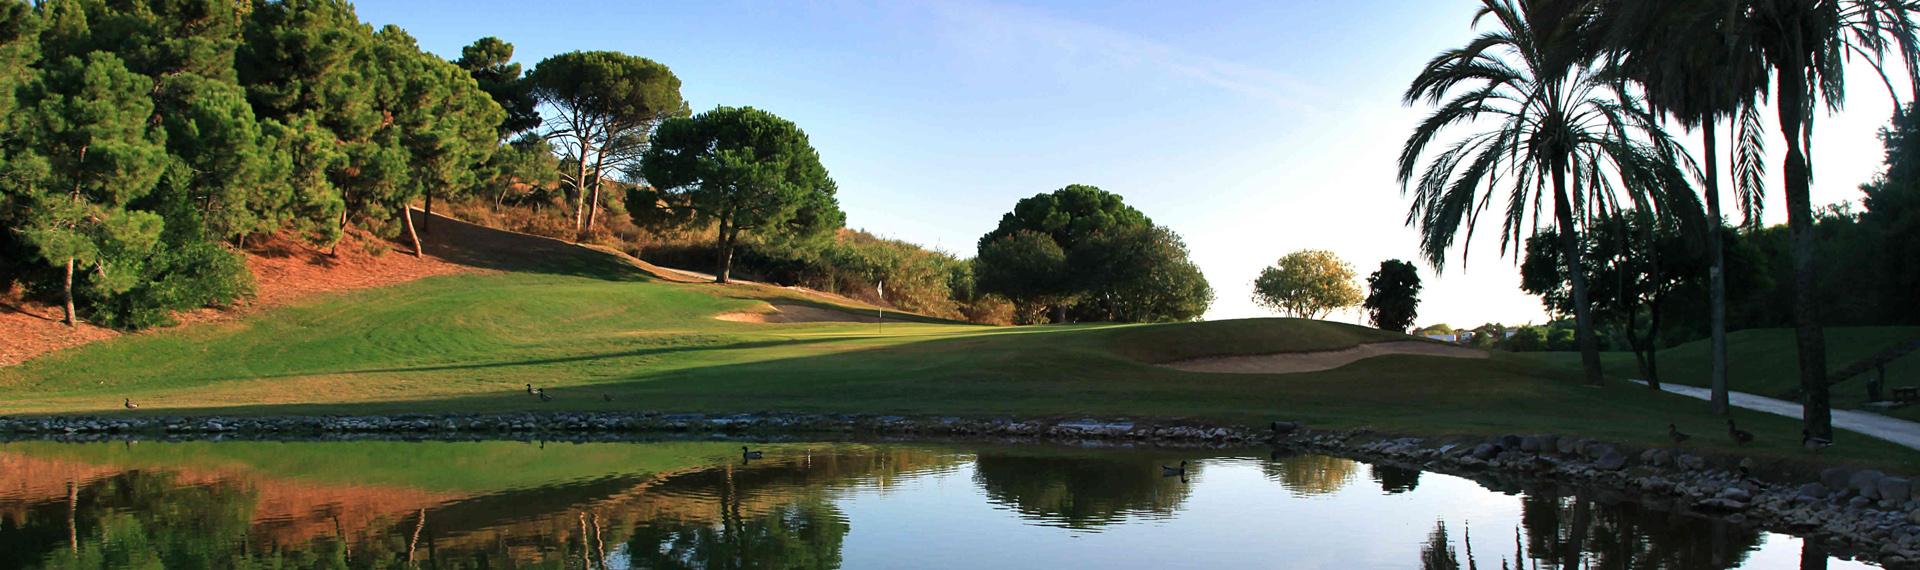 viajes-de-golf